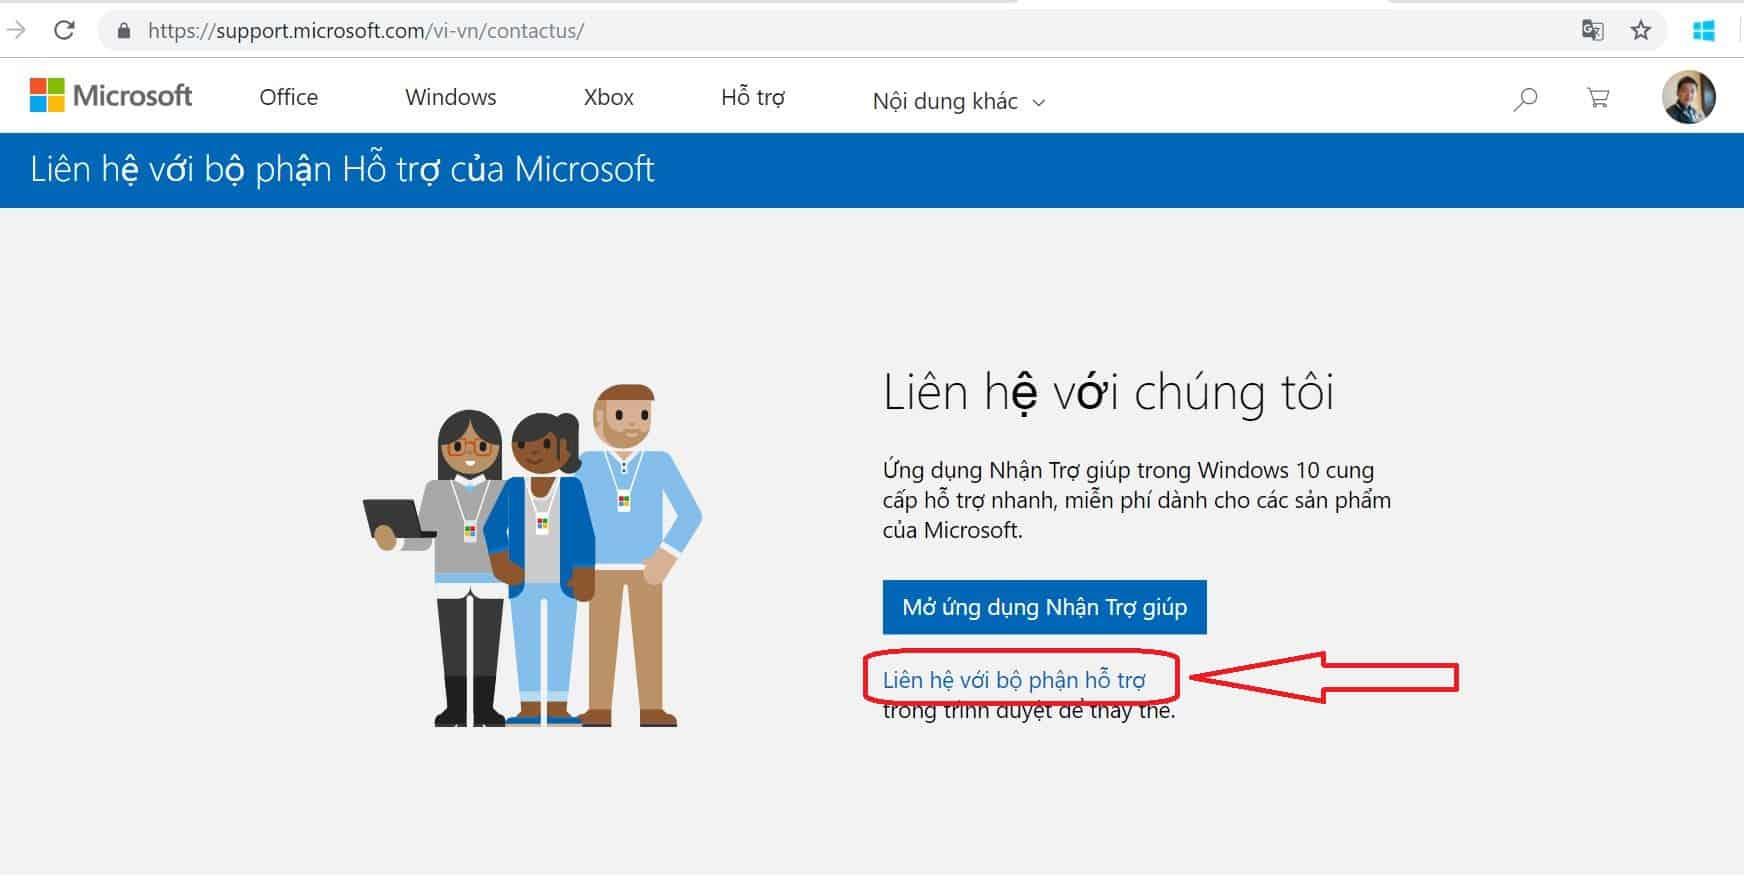 Microsoft Ho tro